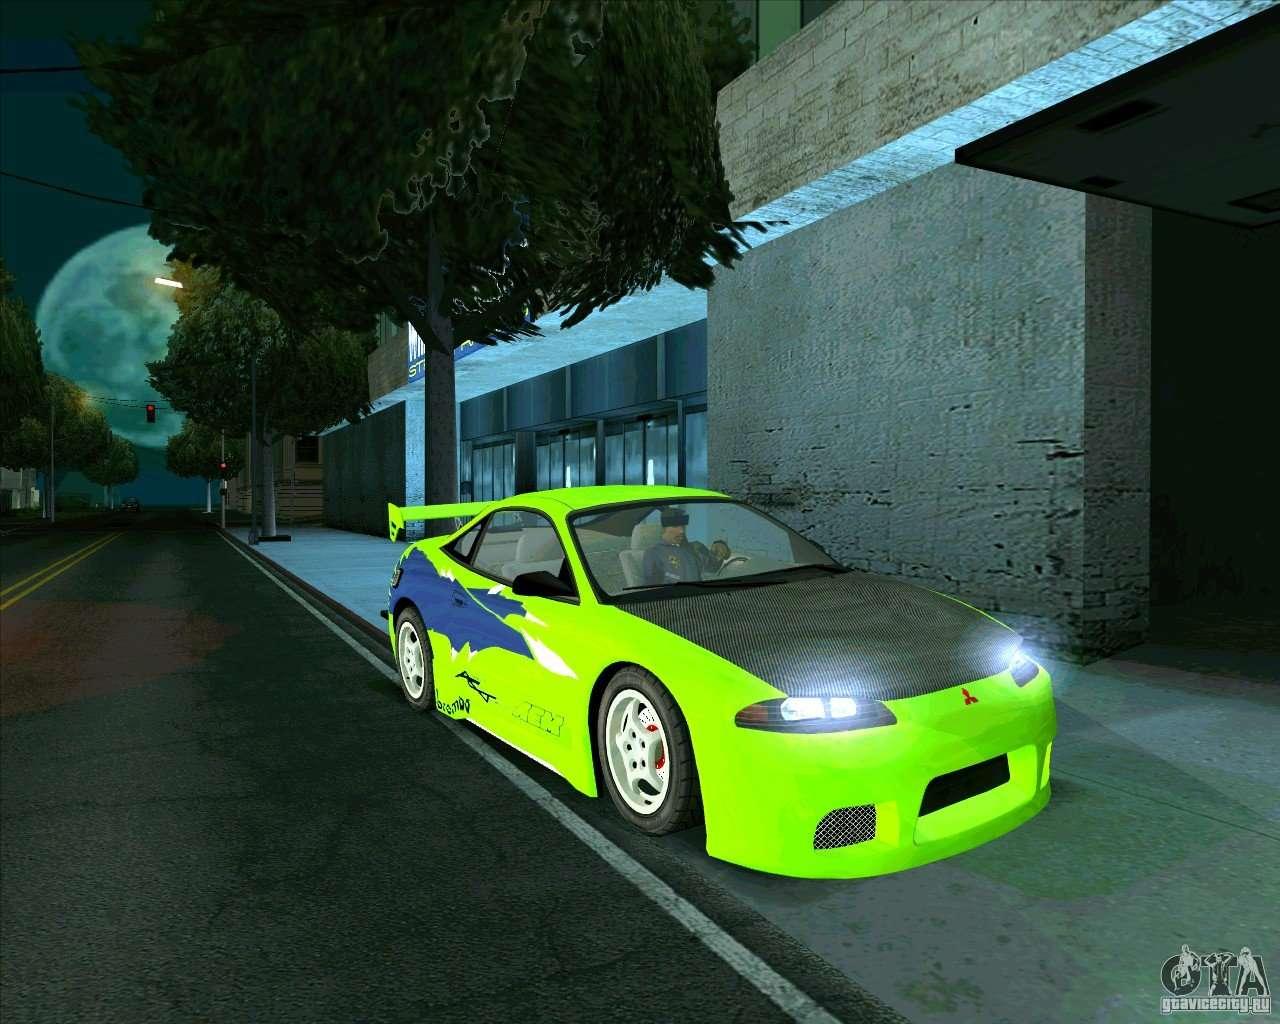 Gta San Andreas Тройной Форсаж: Игру